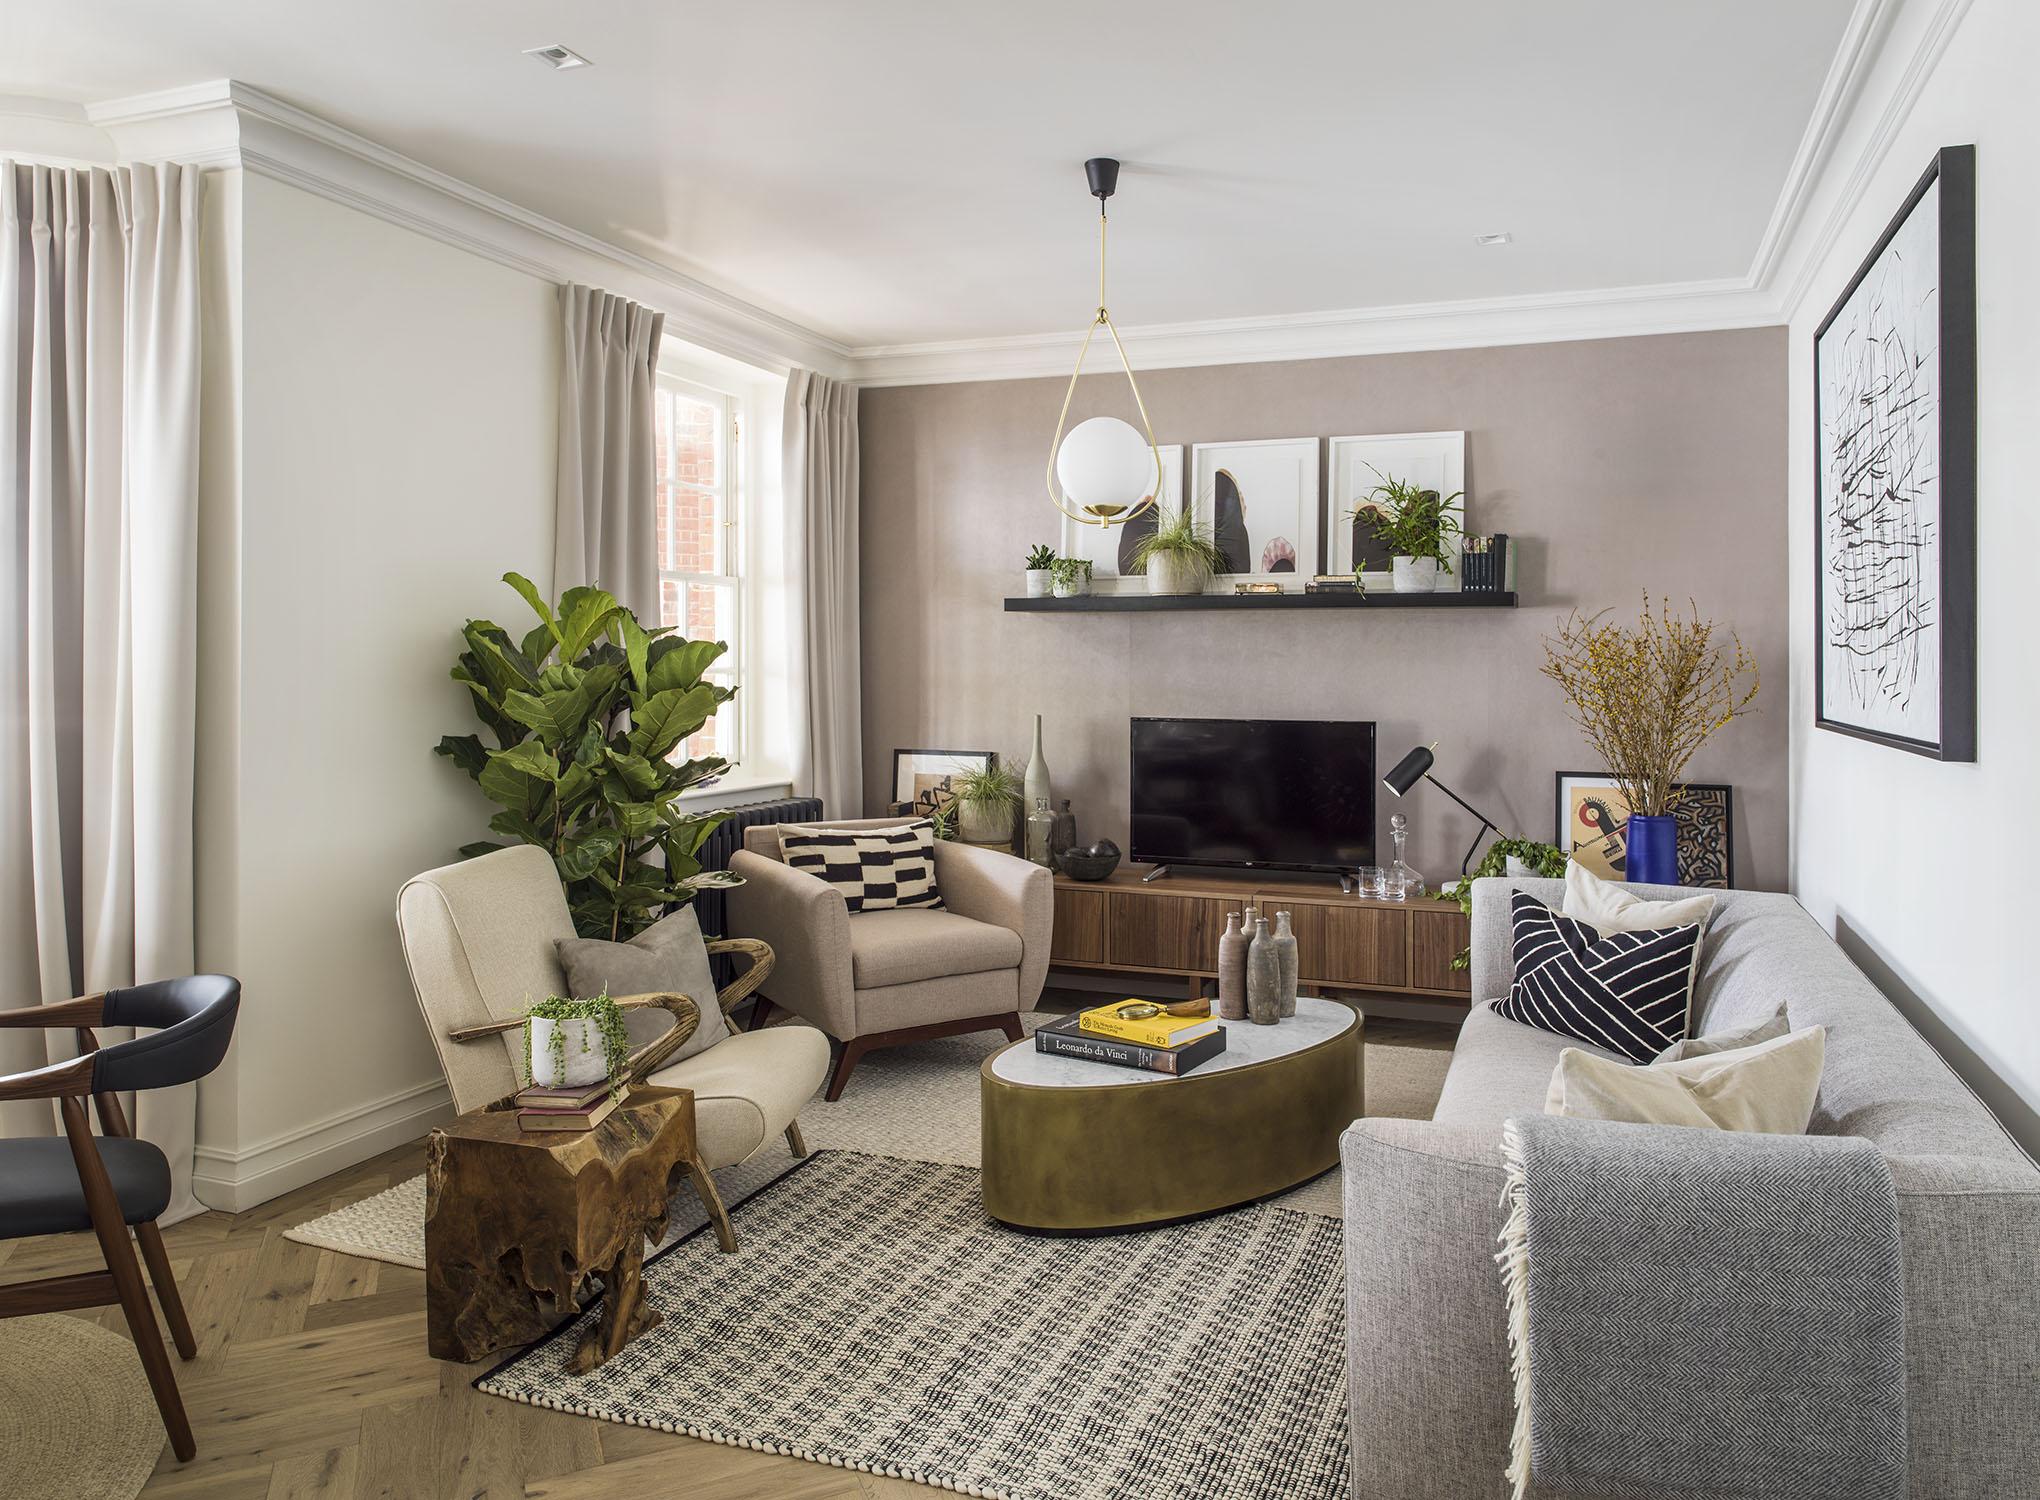 Goddard Littlefair,Lounge